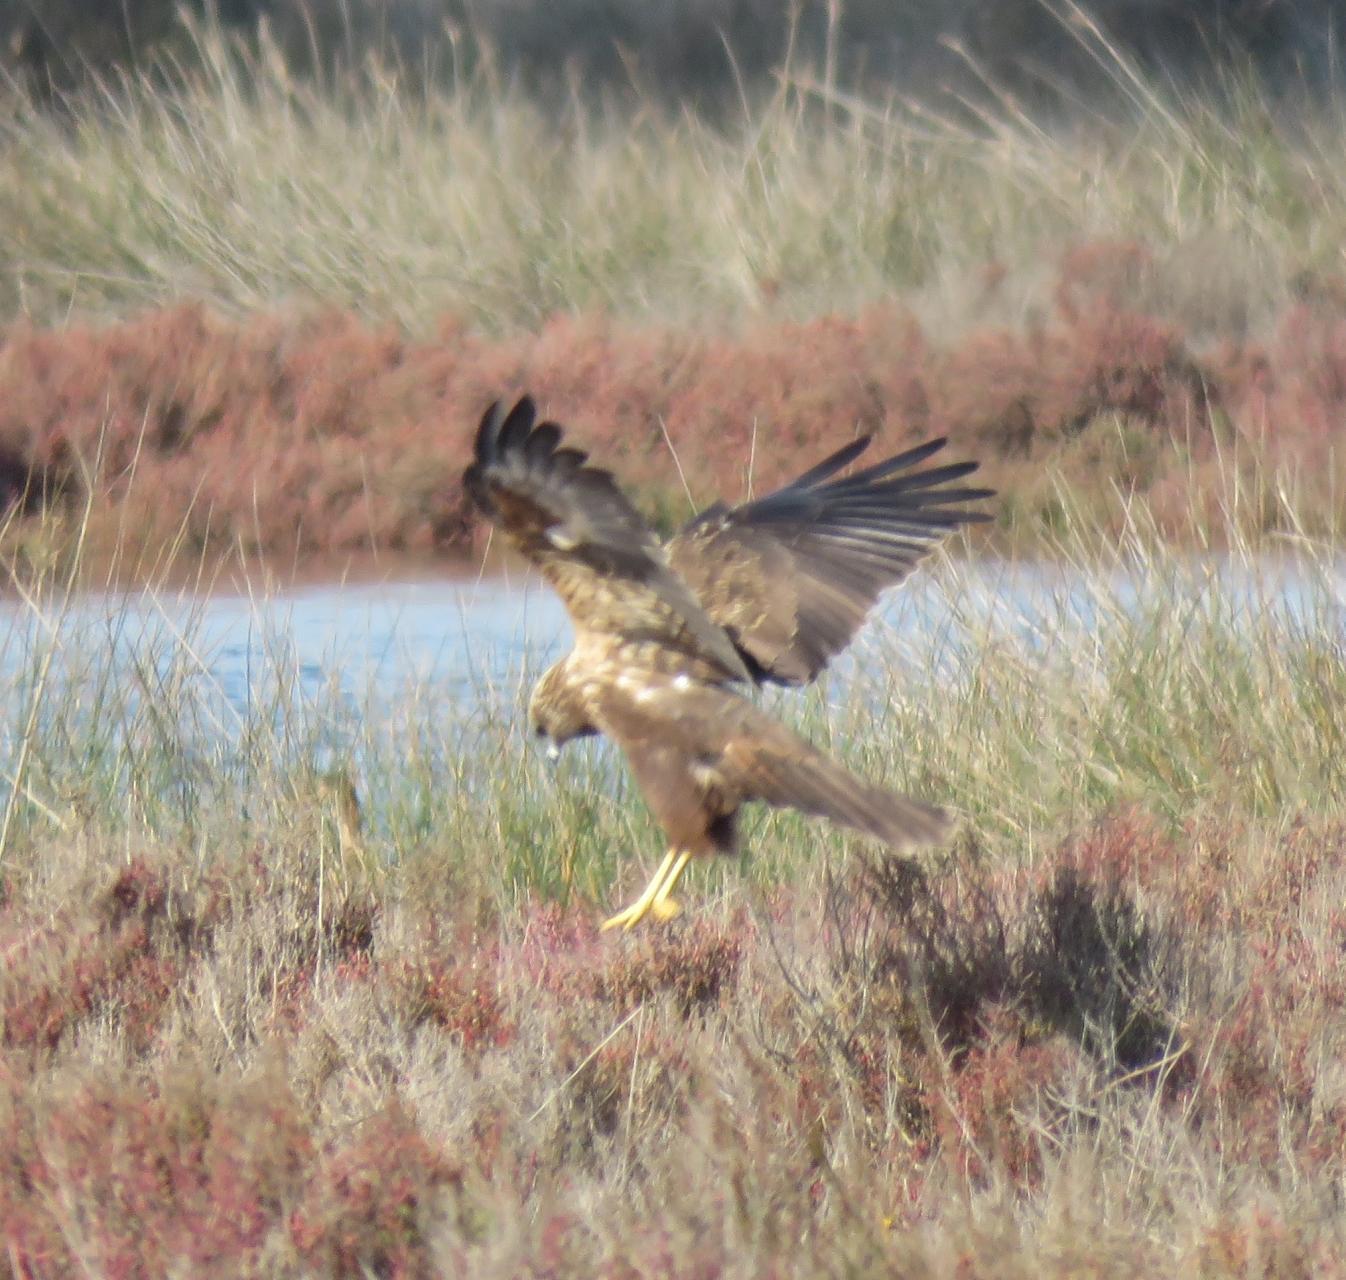 Female hovering